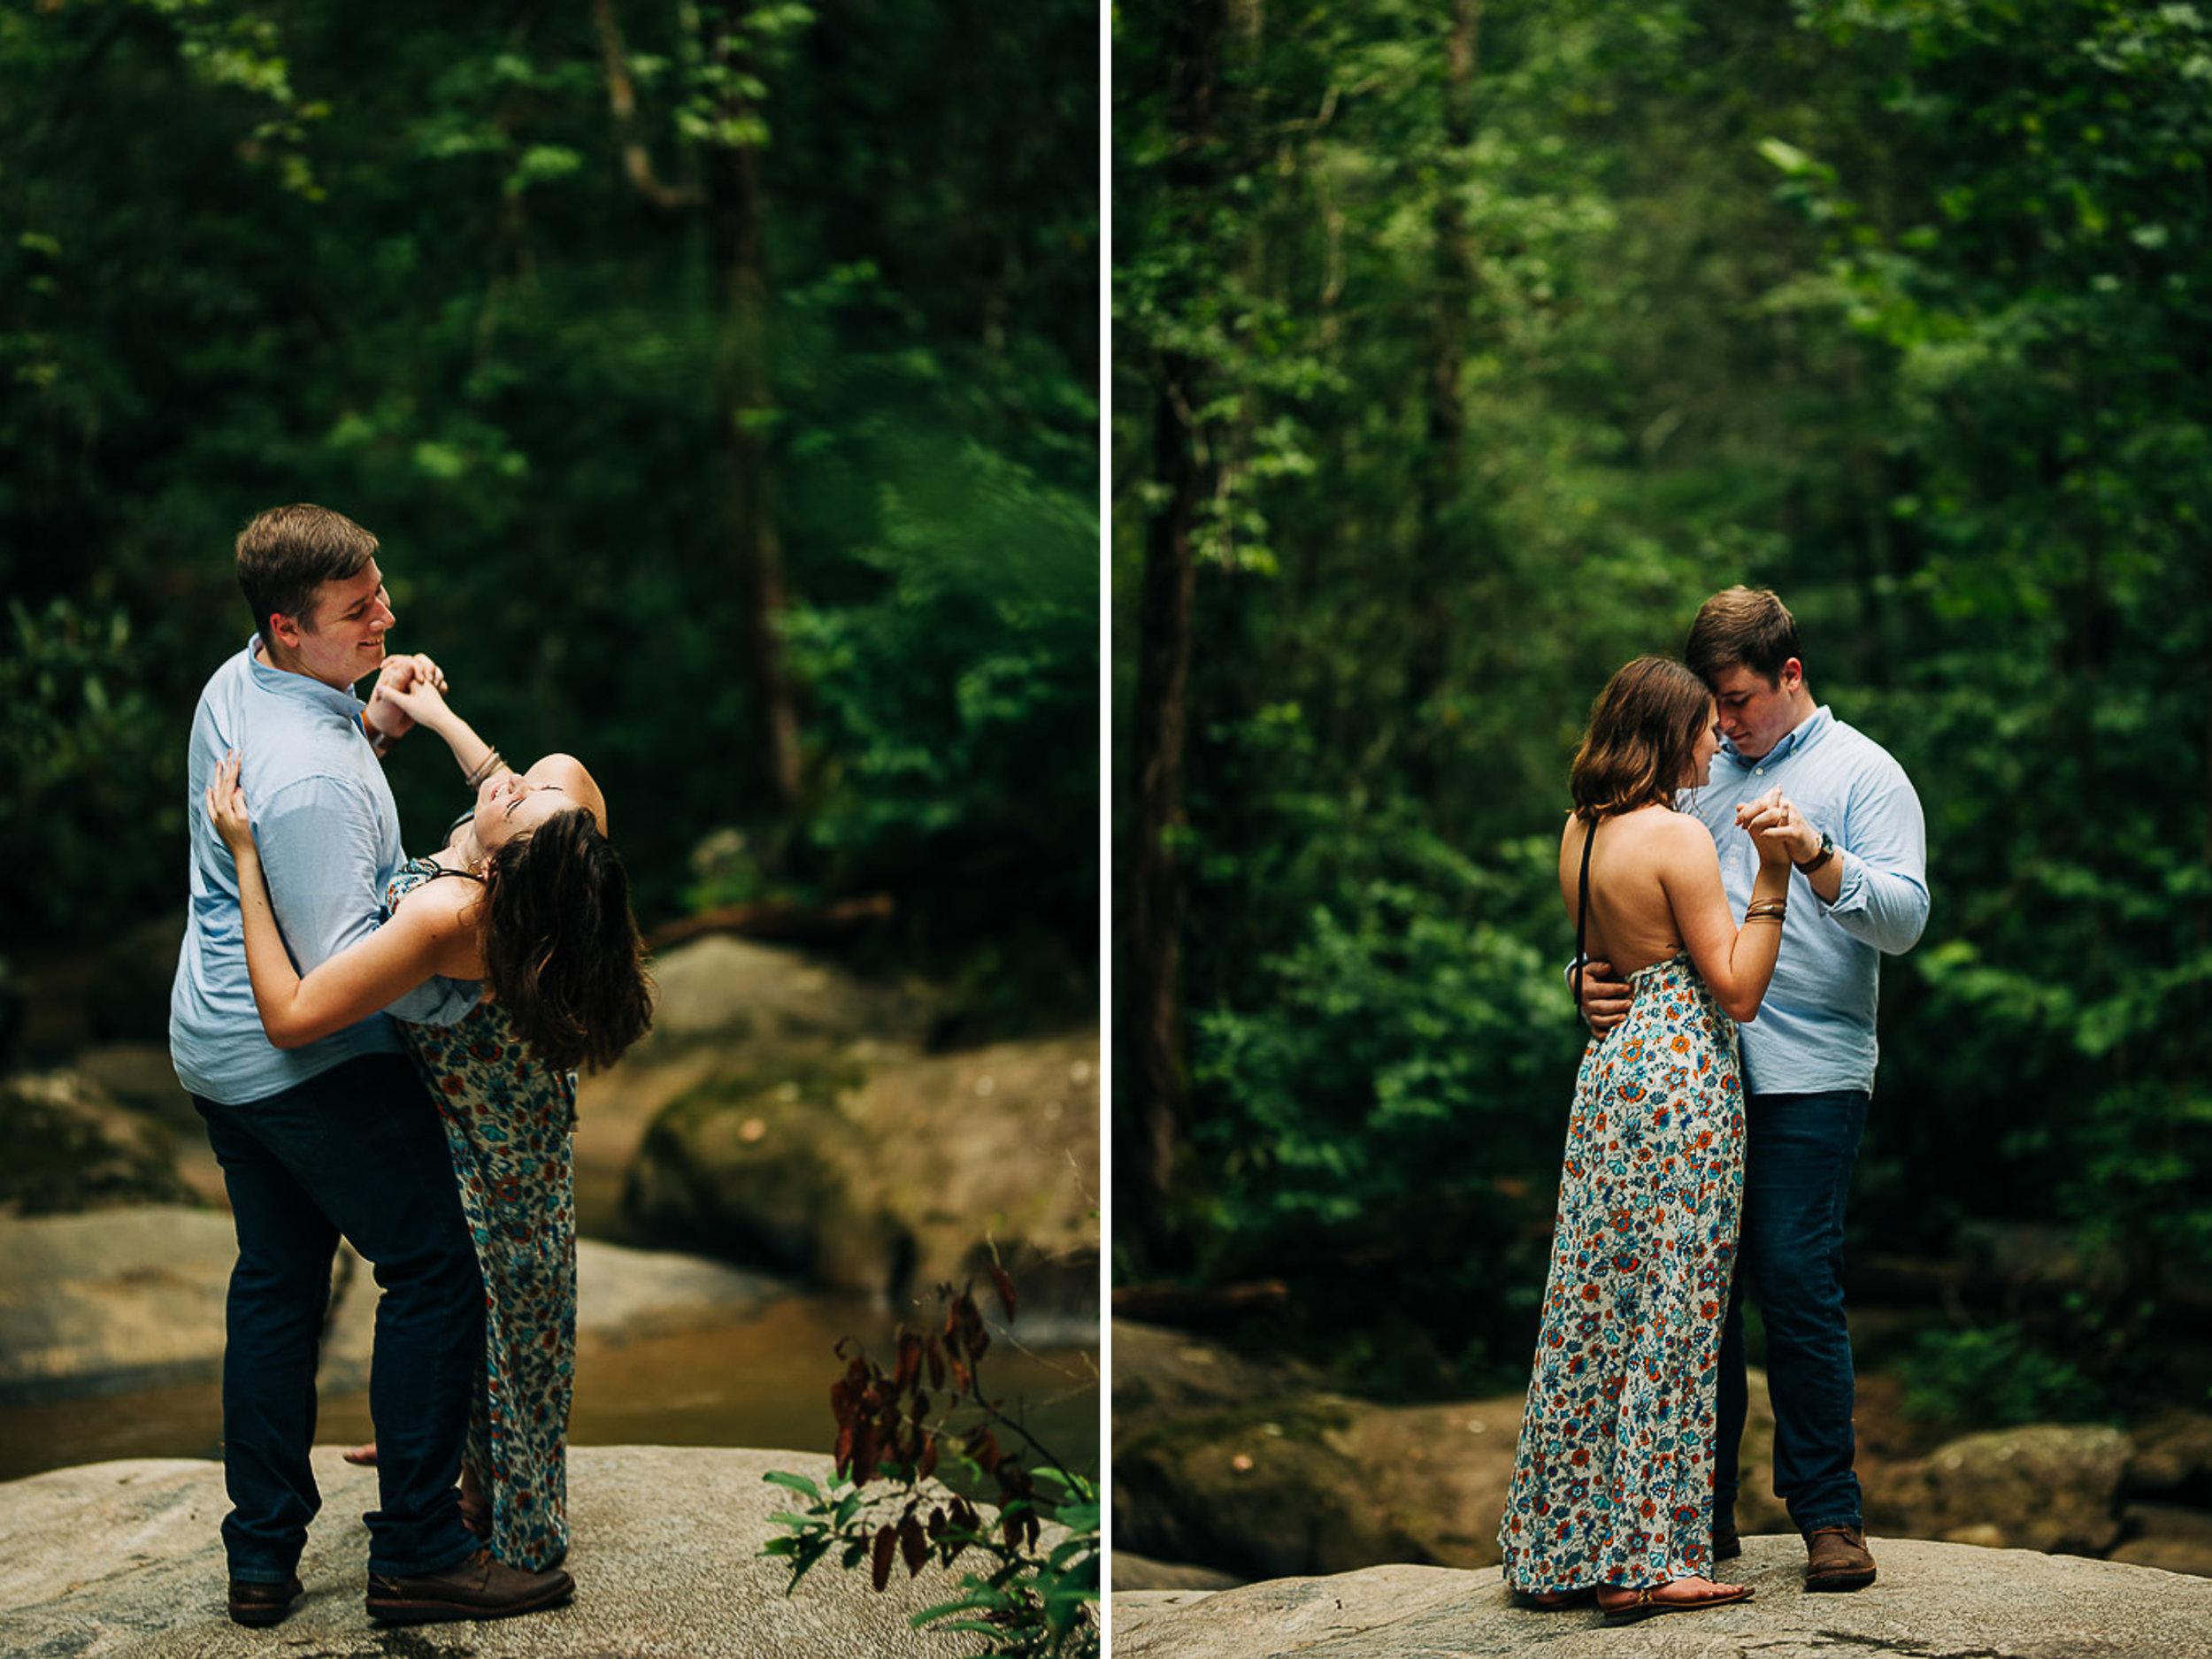 River Engagement Portraits, Summer Engagement Portraits, Engaged, South Carolina 13.jpg